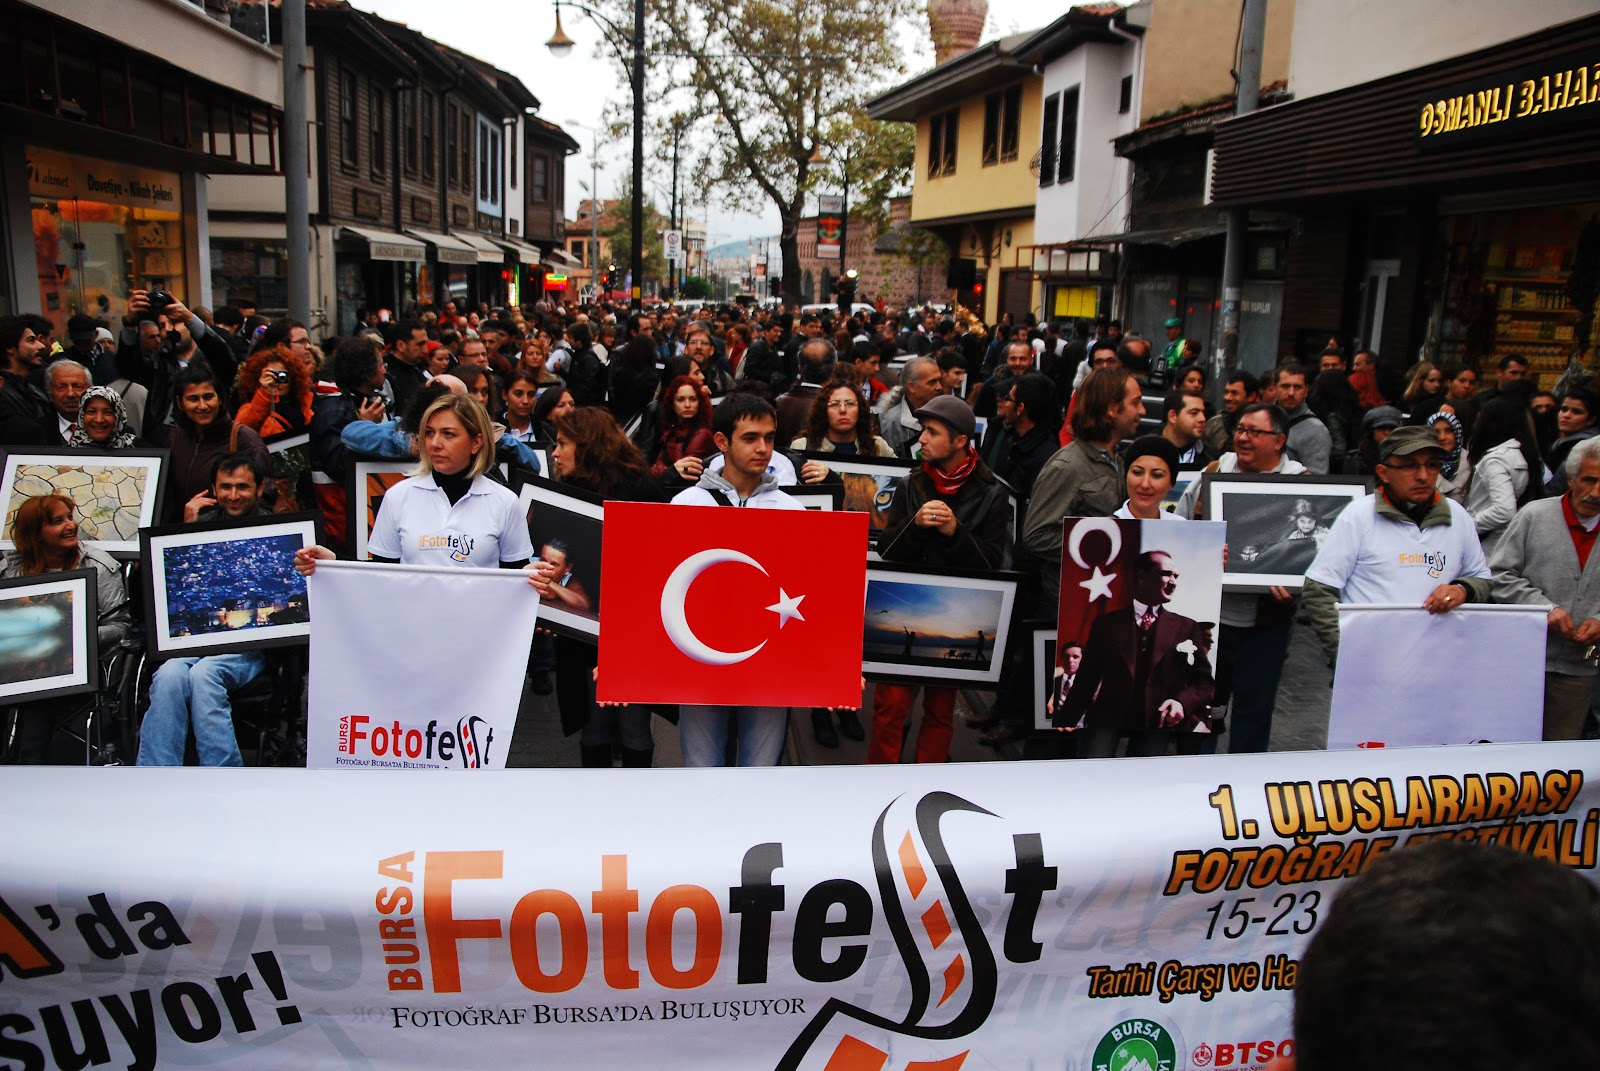 Bursa Fotofest 2011